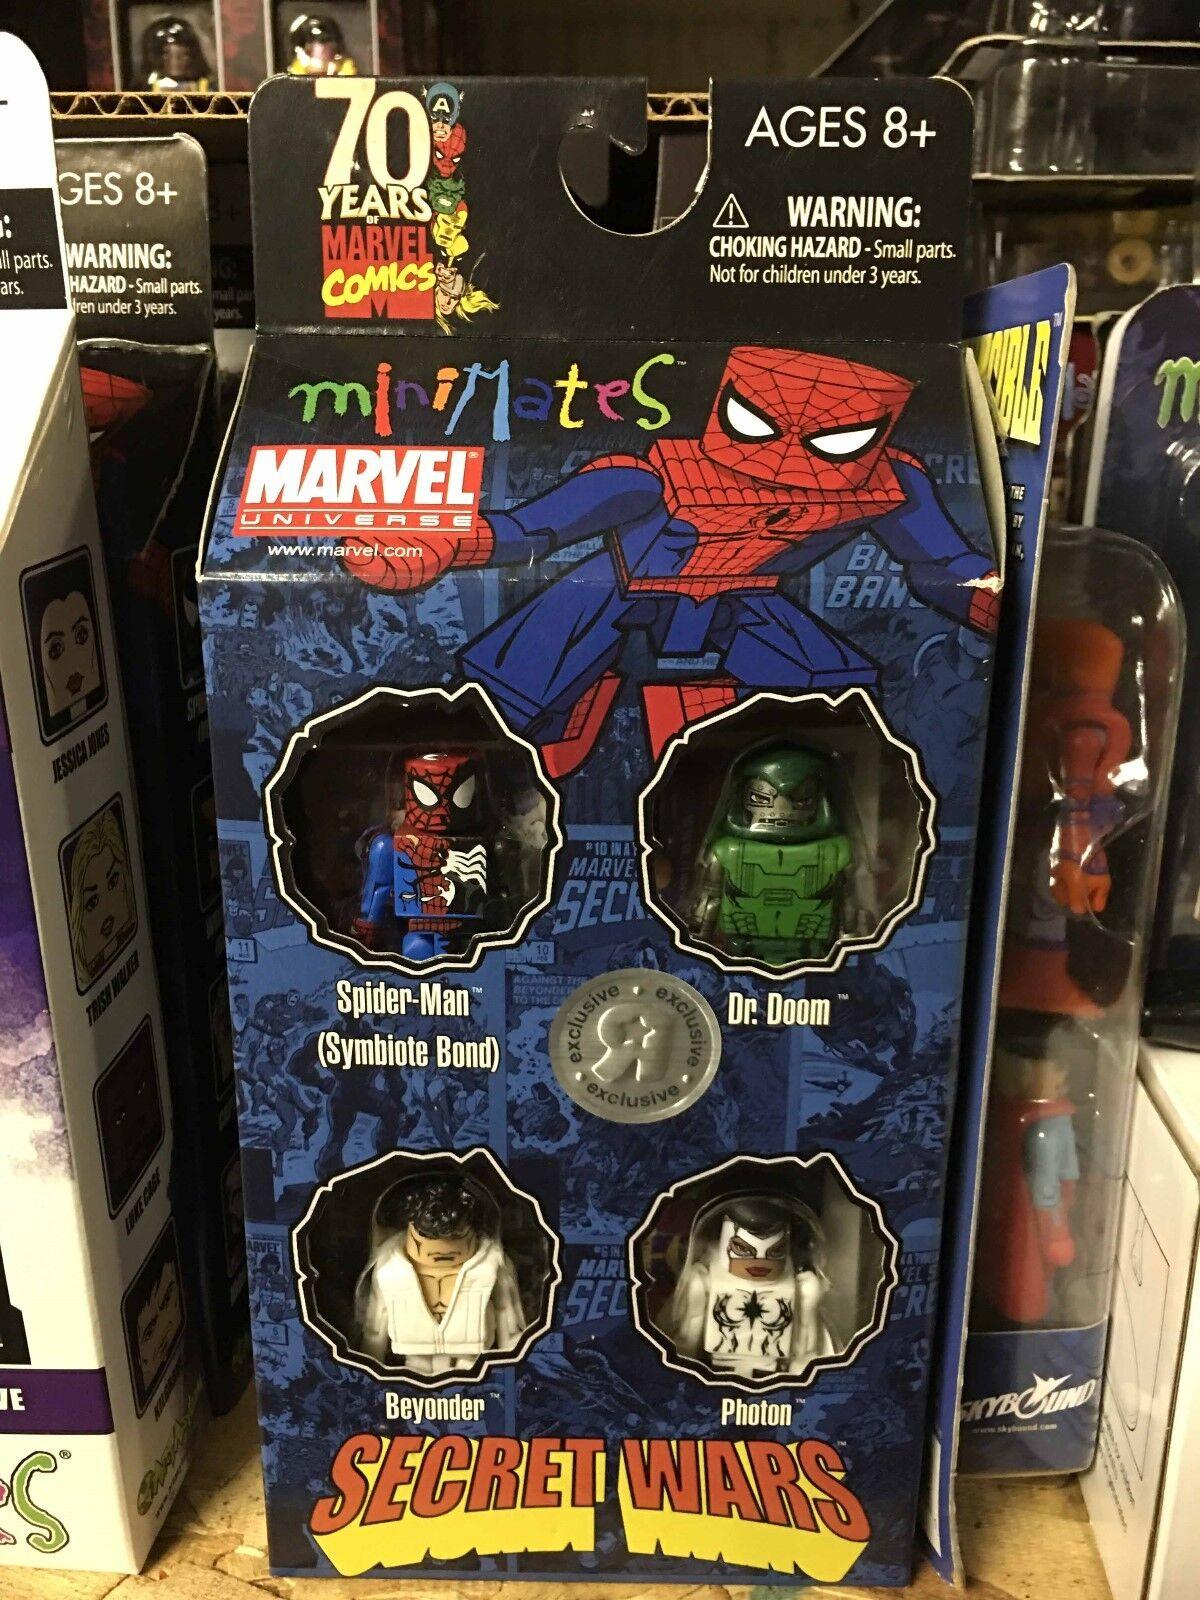 Marvel Minimates SECRET WARS Box Set TRU Exclusive PHOTON BEYOND DOOM SPIDER-MAN